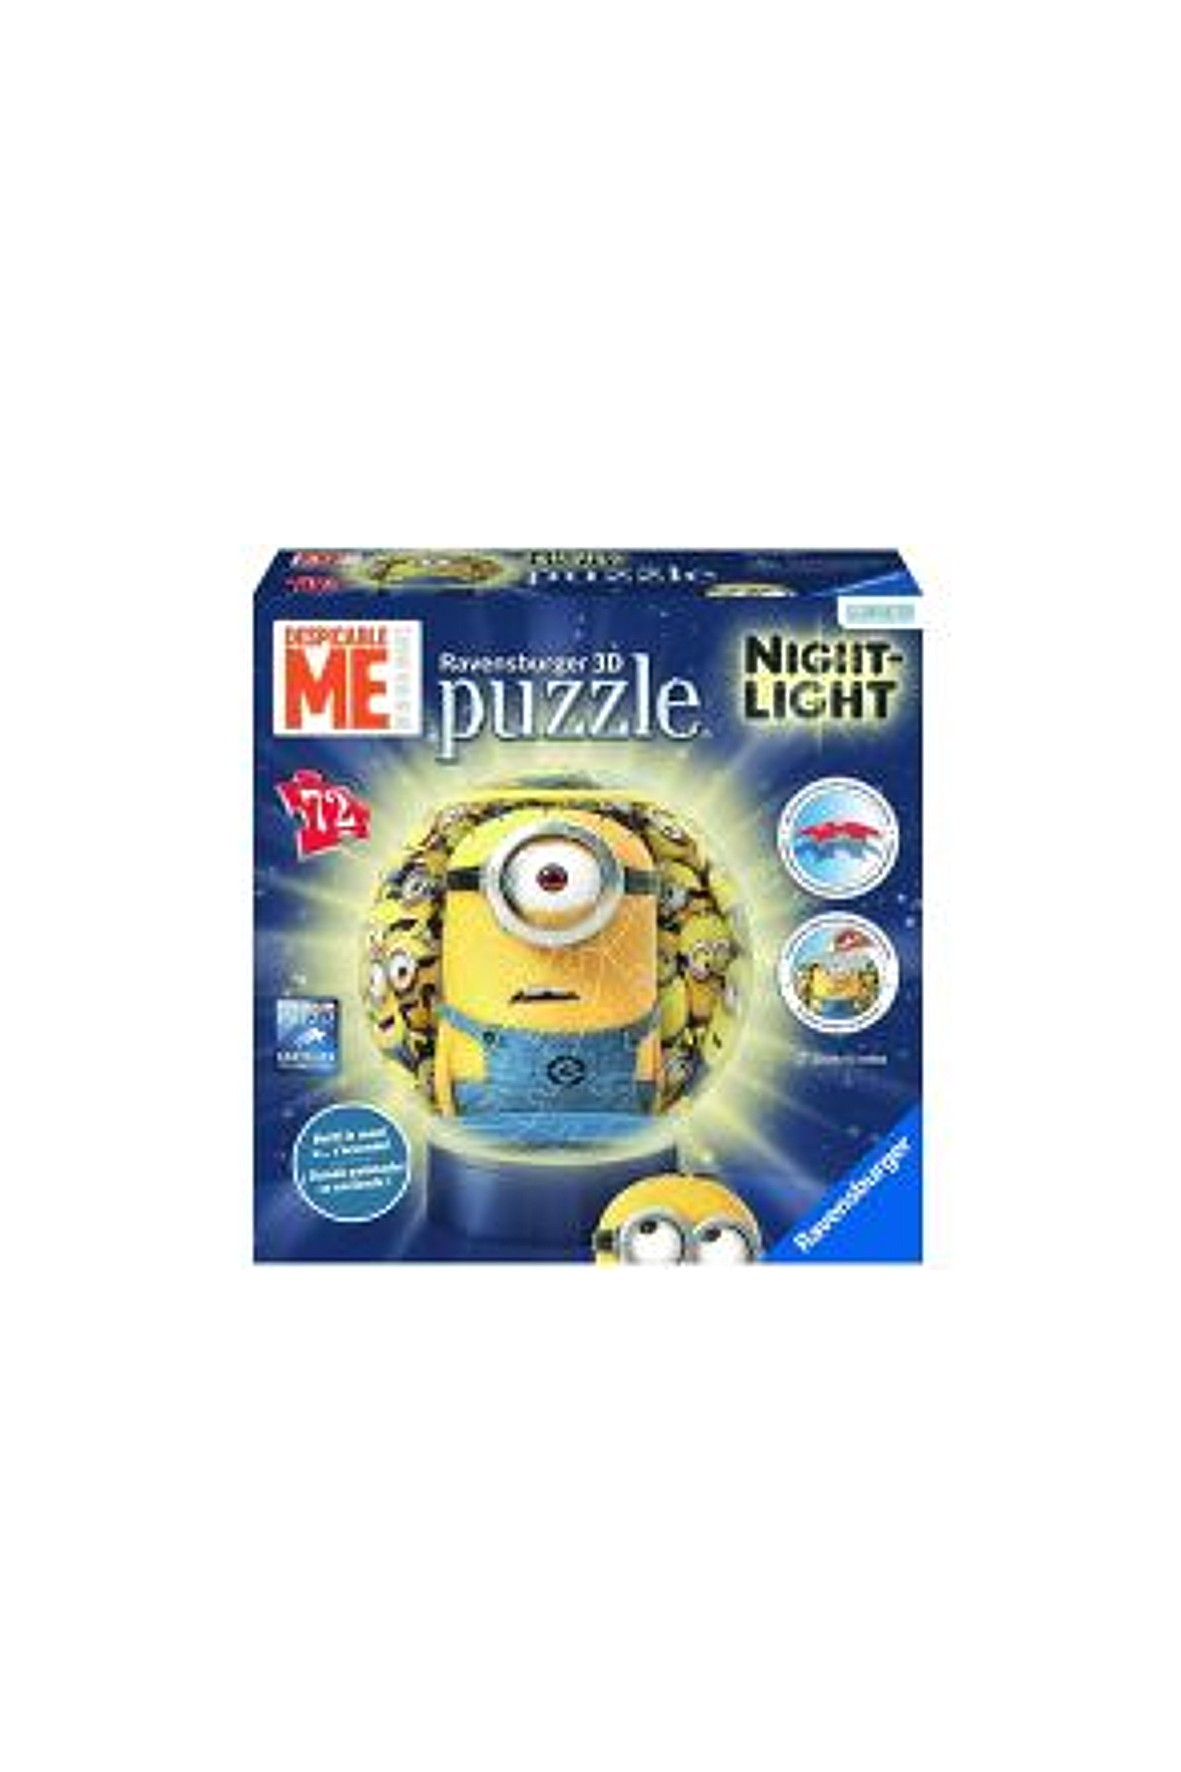 Puzzle Mininki kuliste 72 el Edycja Nocna- z lampką nocną